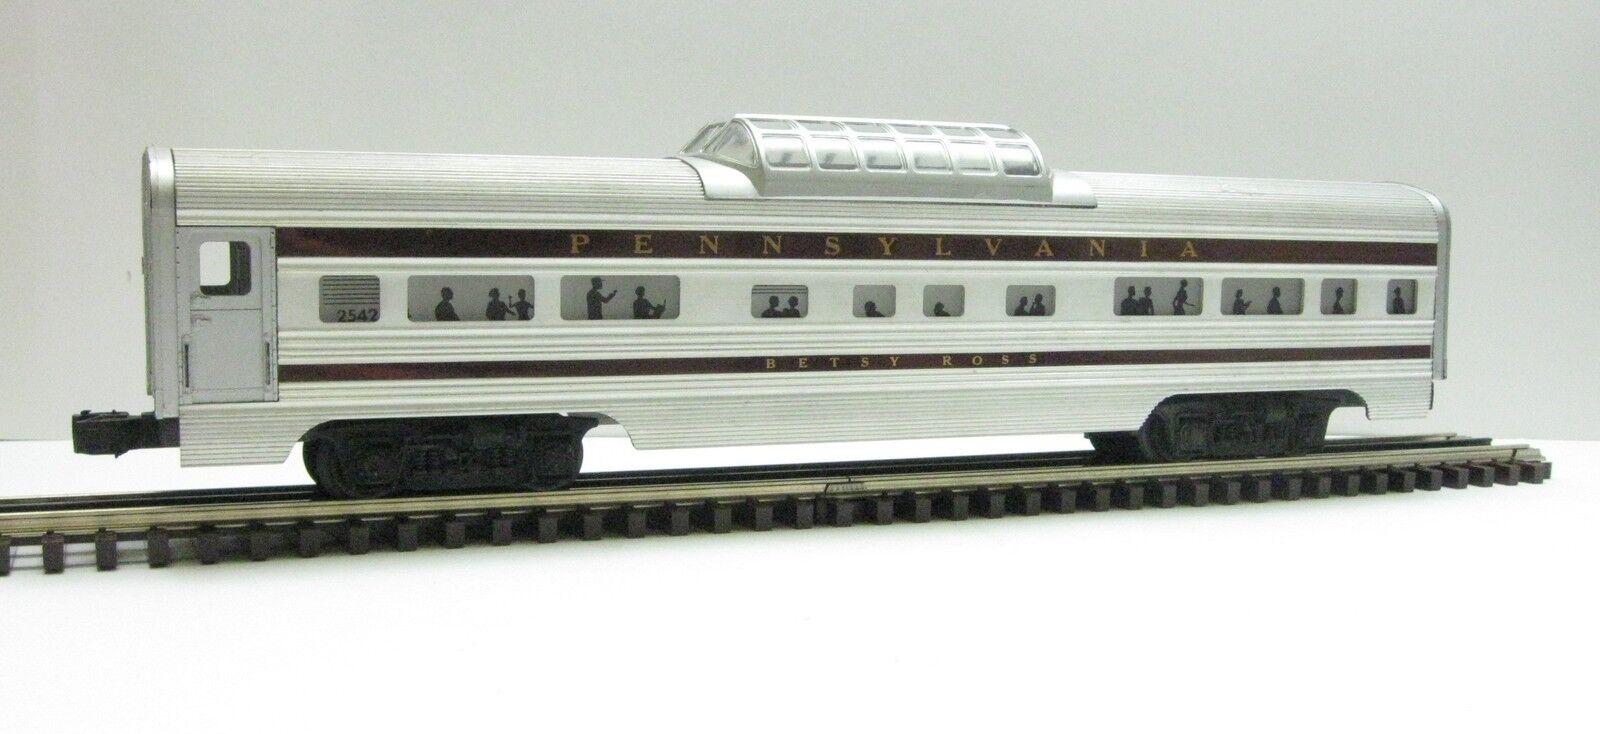 Lionel 2542 O Gauge Betsy Ross Vista Dome Aluminum Passenger Car (2542B)